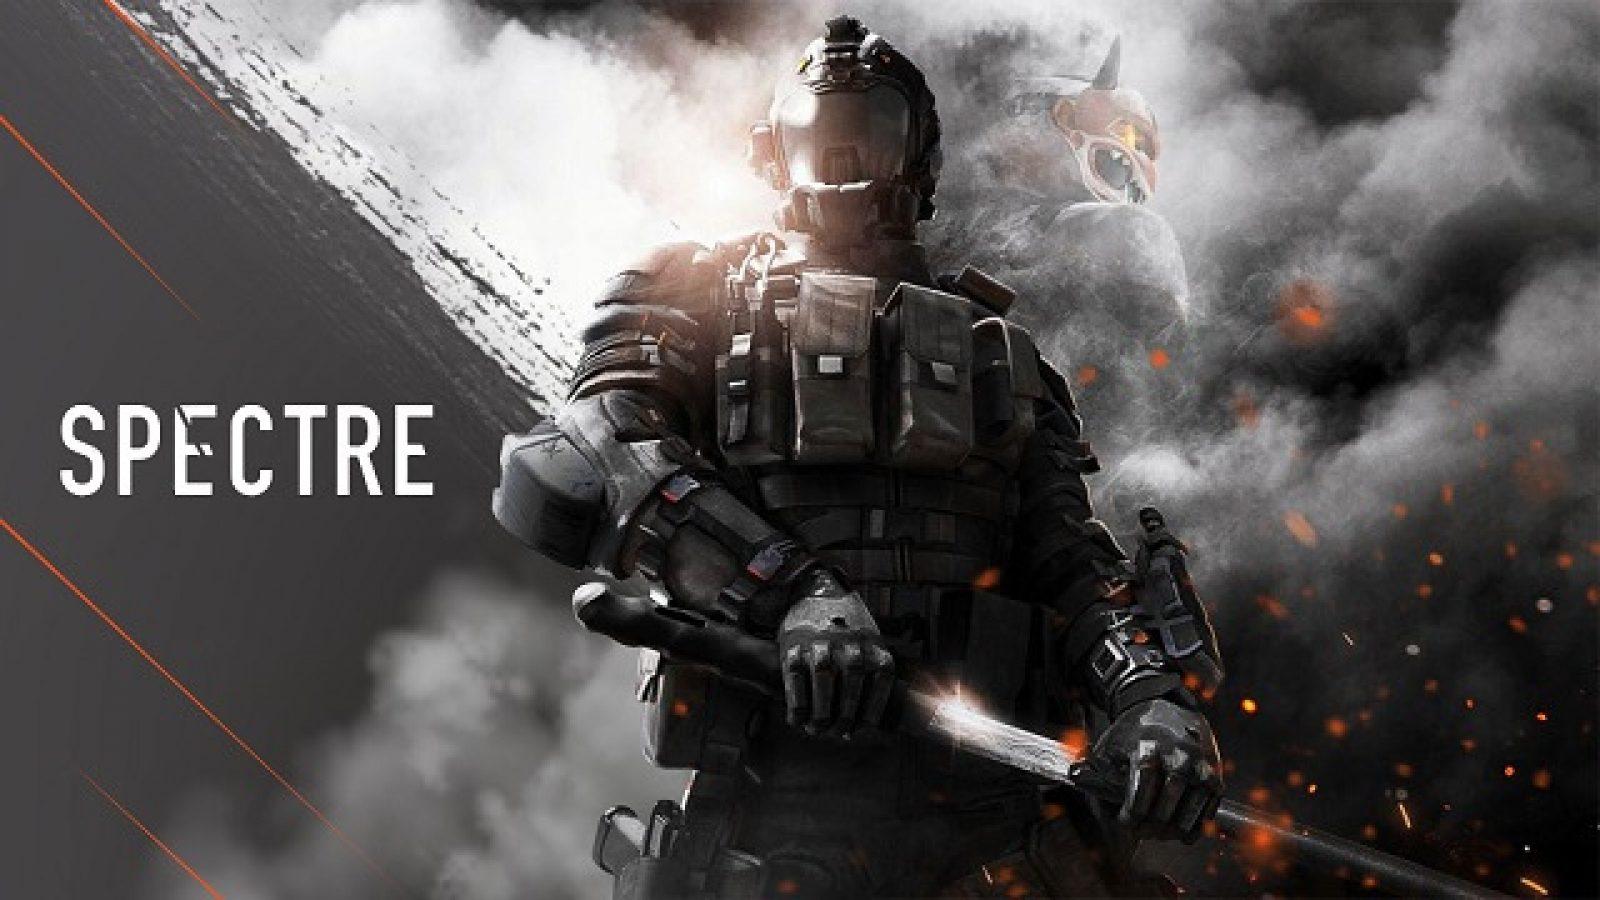 Call Of Duty How To Unlock Spectre Specialist In Black Ops 4 Dexerto